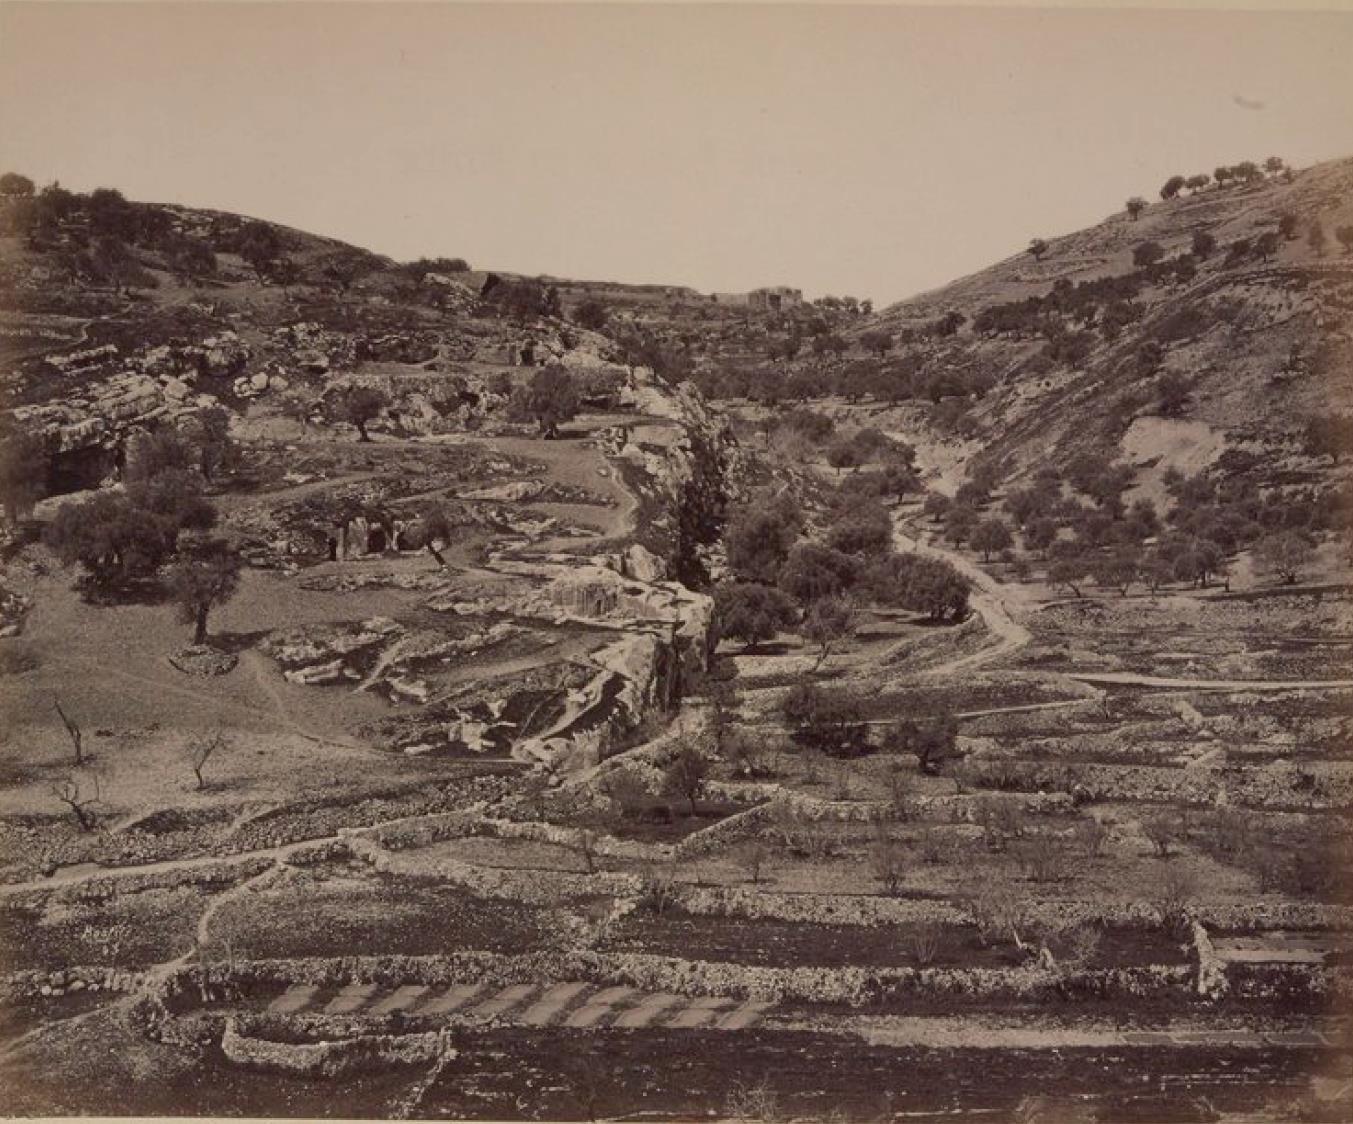 29. Окрестности Иерусалима. Акелдама («Земля горшечника», «Поле крови»)